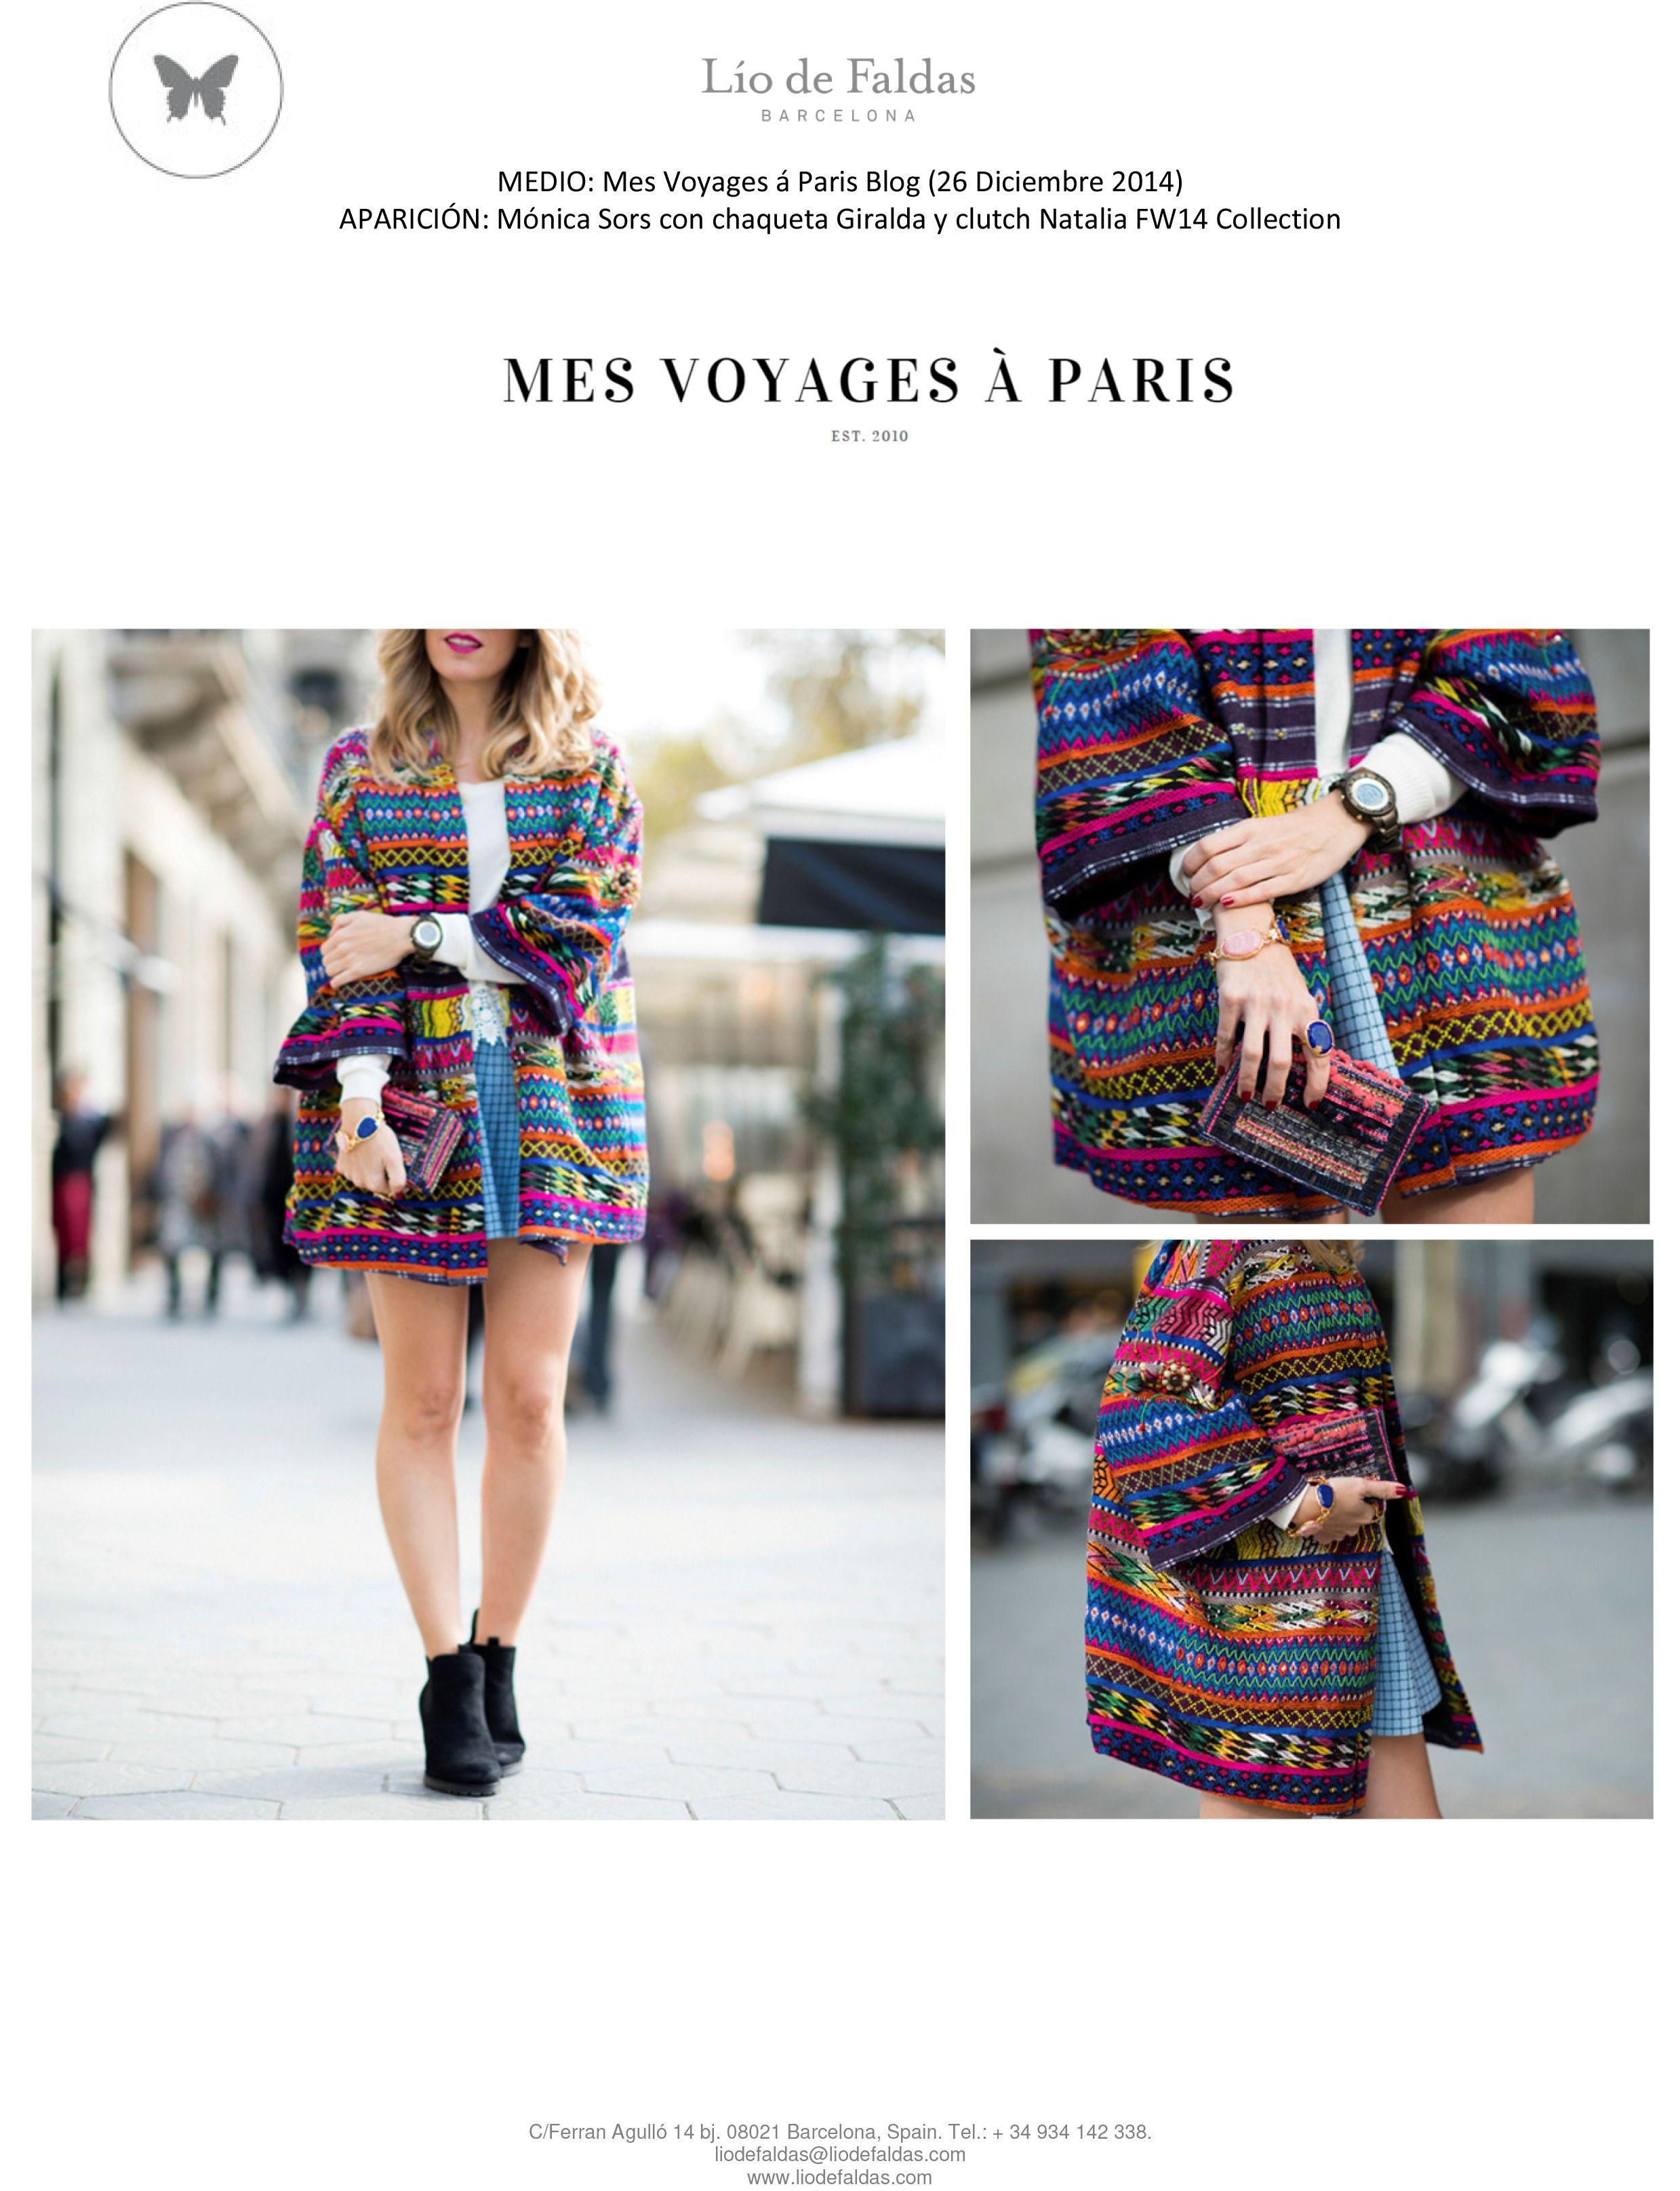 Mes voyages à Paris (December 2014) FW14 Collection. Colorful jacket Giralda.